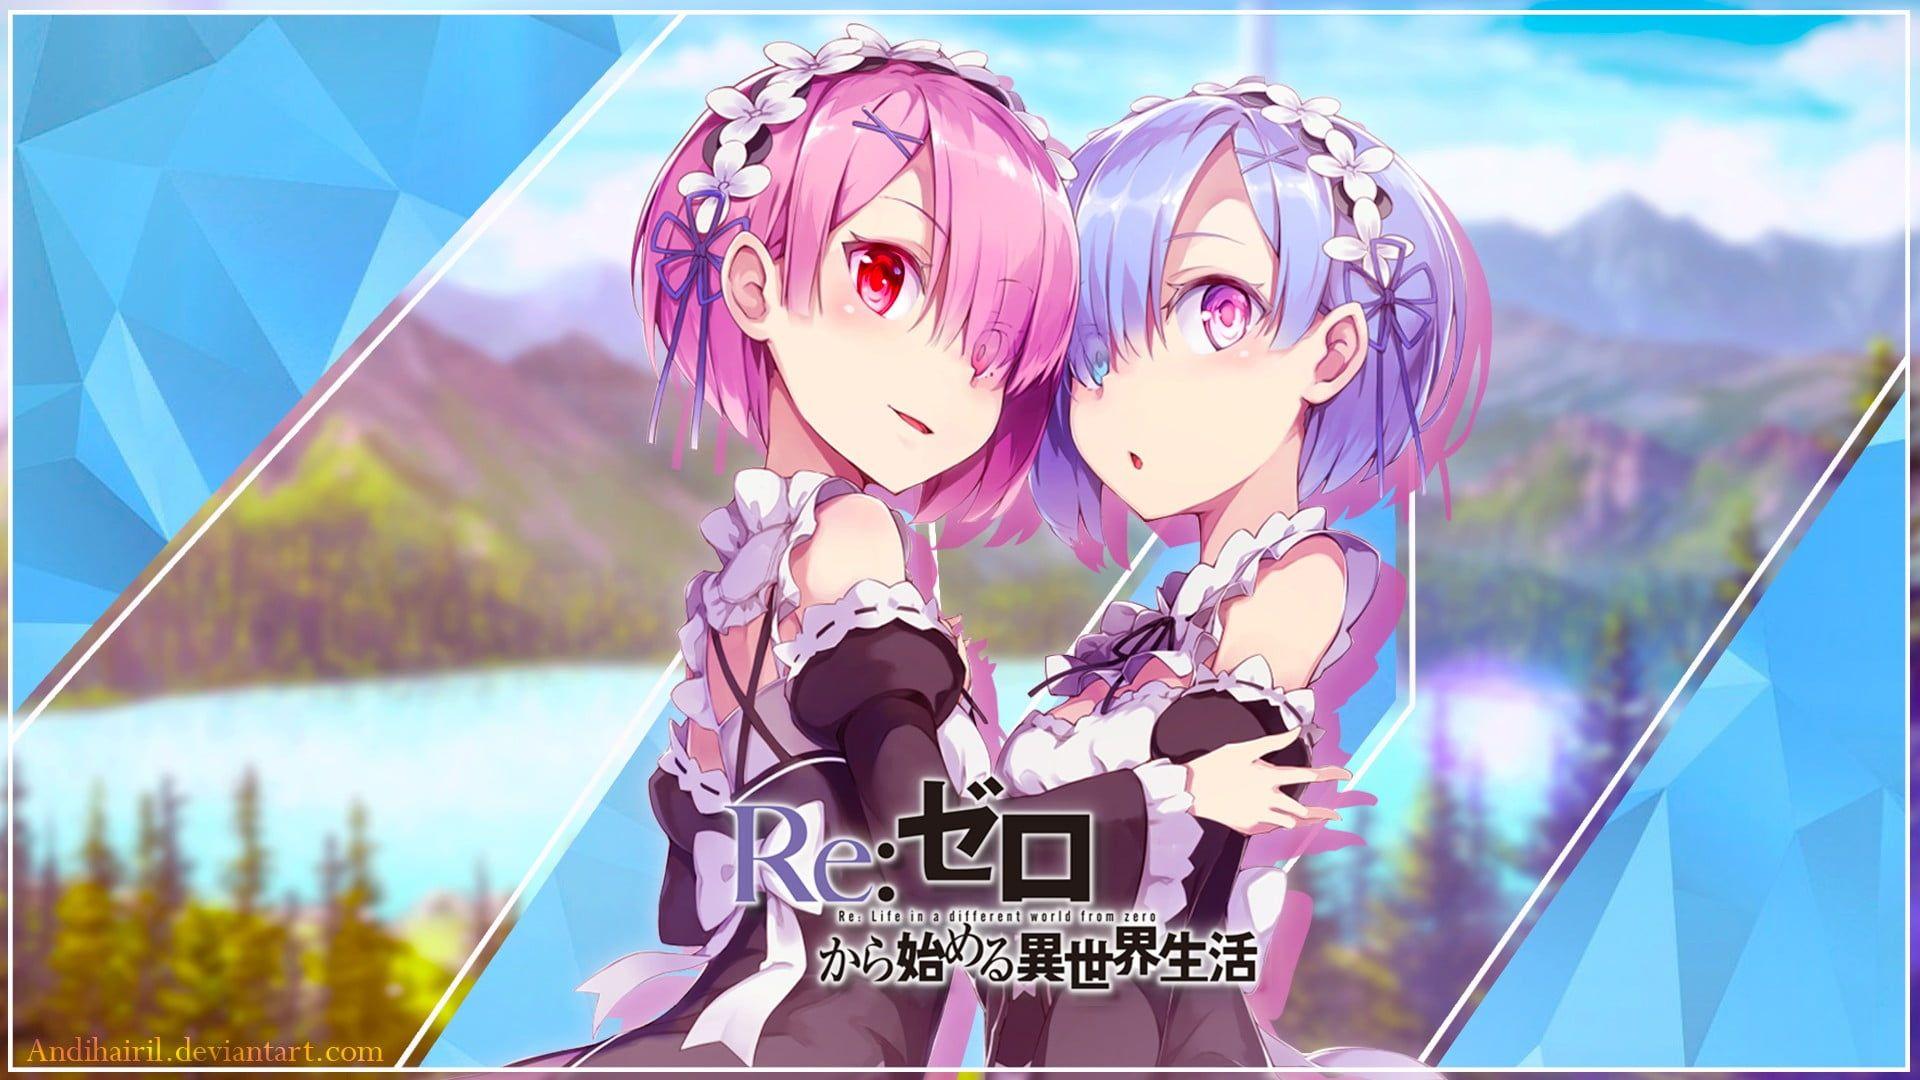 Ram And Rem Re Zero Characters Digital Wallpaper Re Zero Kara Hajimeru Isekai Seikatsu Anime Girls Rem Re Zero Ram Re Zero Landscape Anime Red Eyes Purp